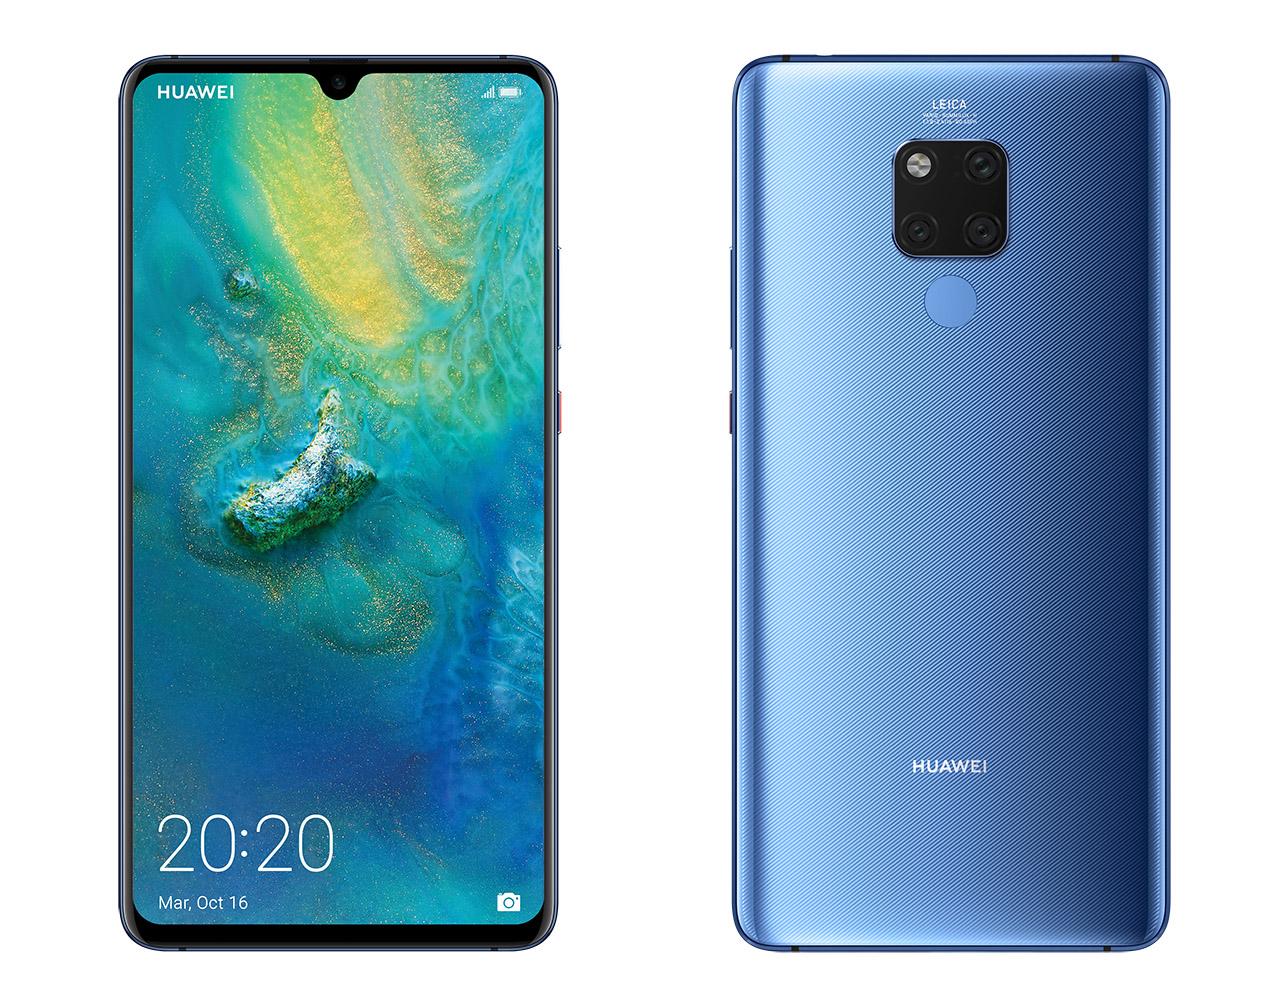 El Huawei Mate 20 X con pantalla de 7.2